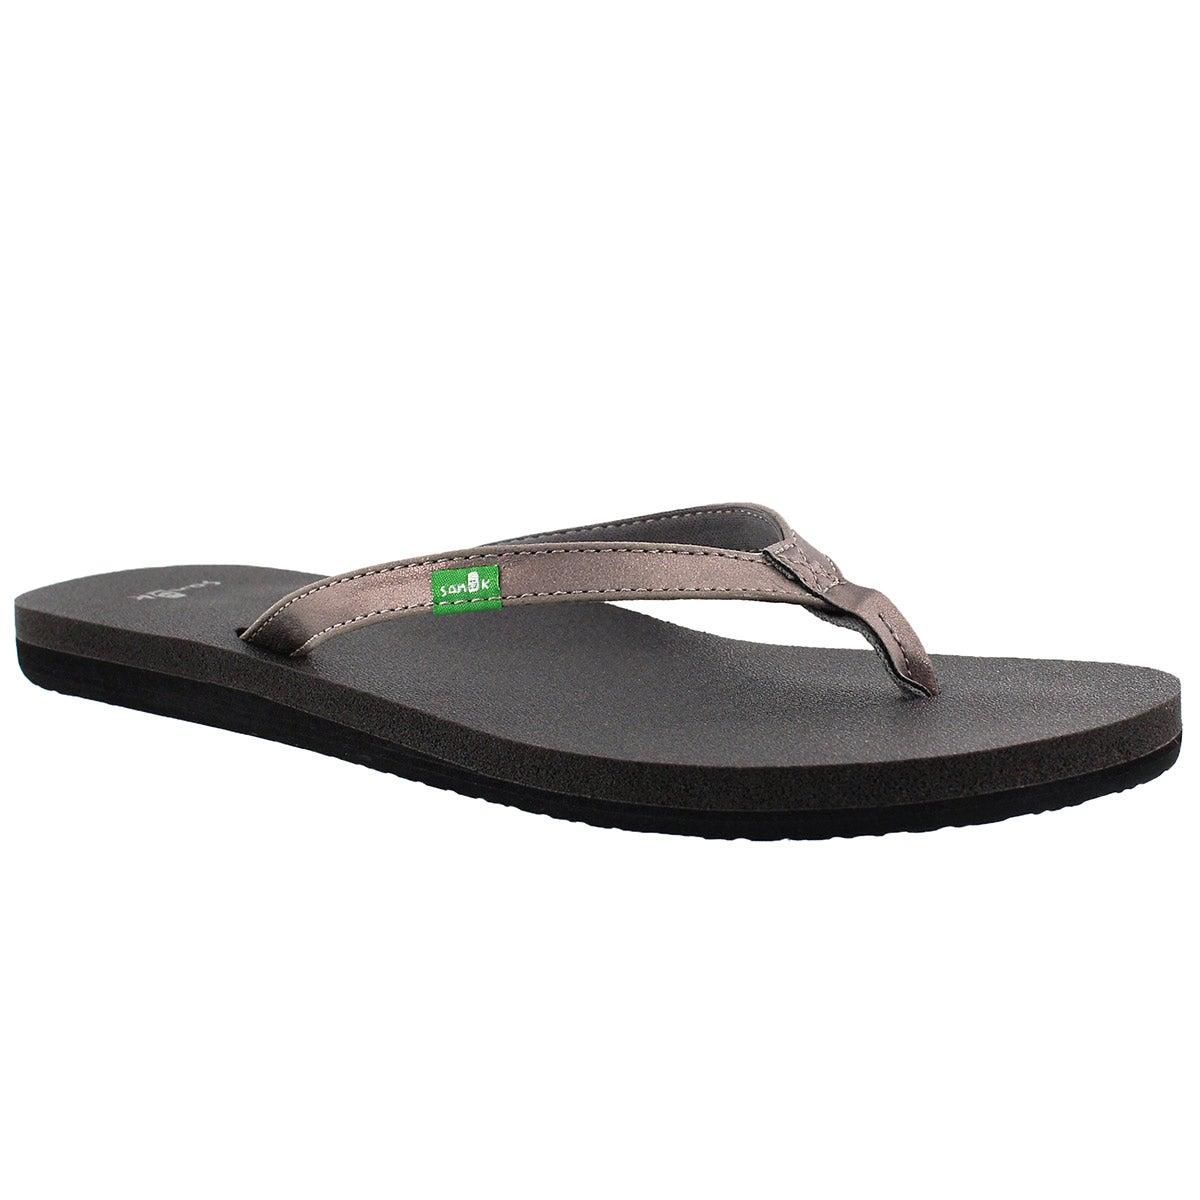 Women's YOGA JOY METALLIC pewter flip flops